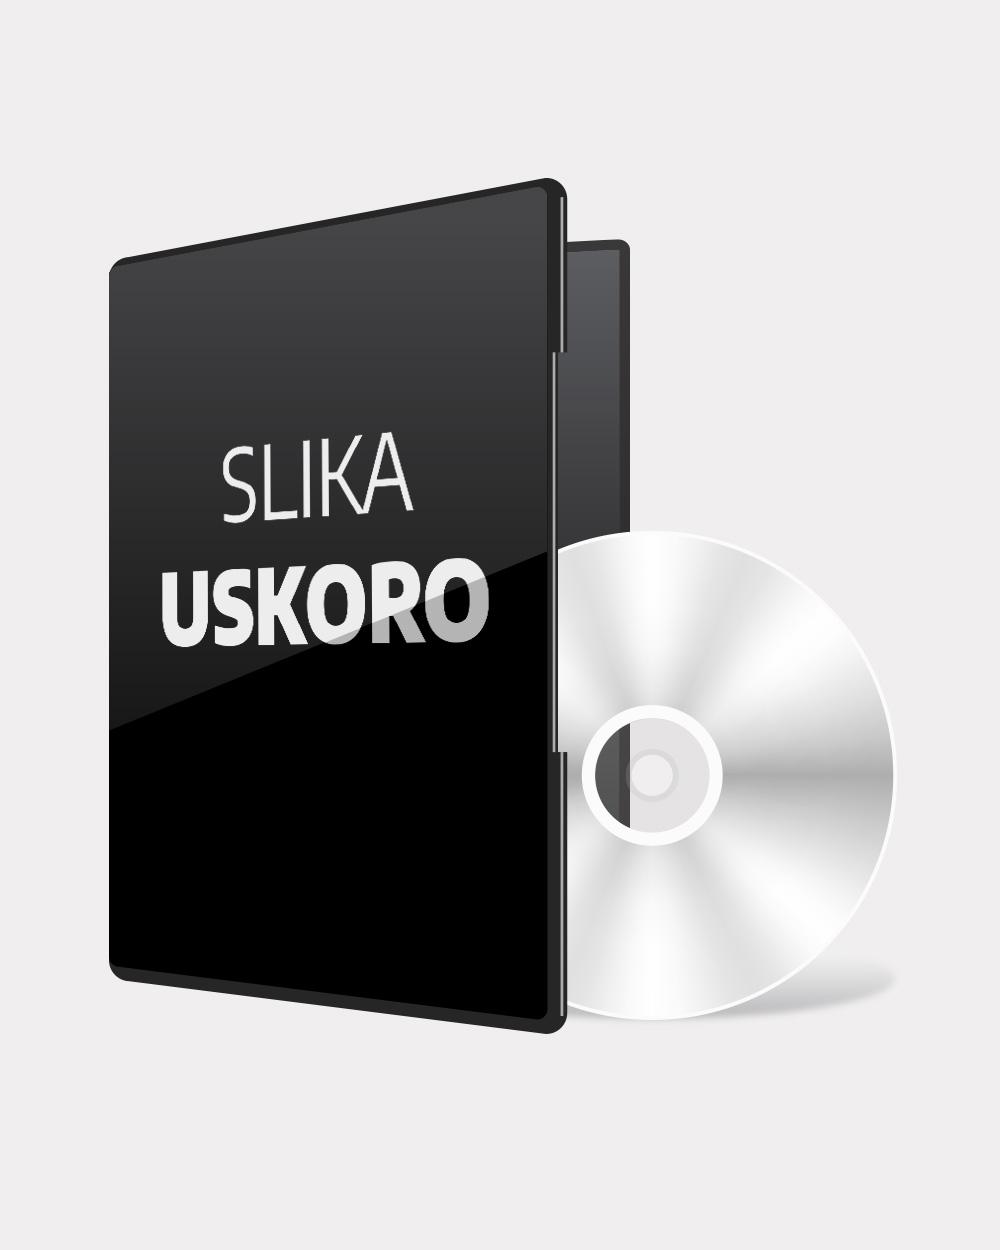 PS4 Marvels Spider-Man Steelbook